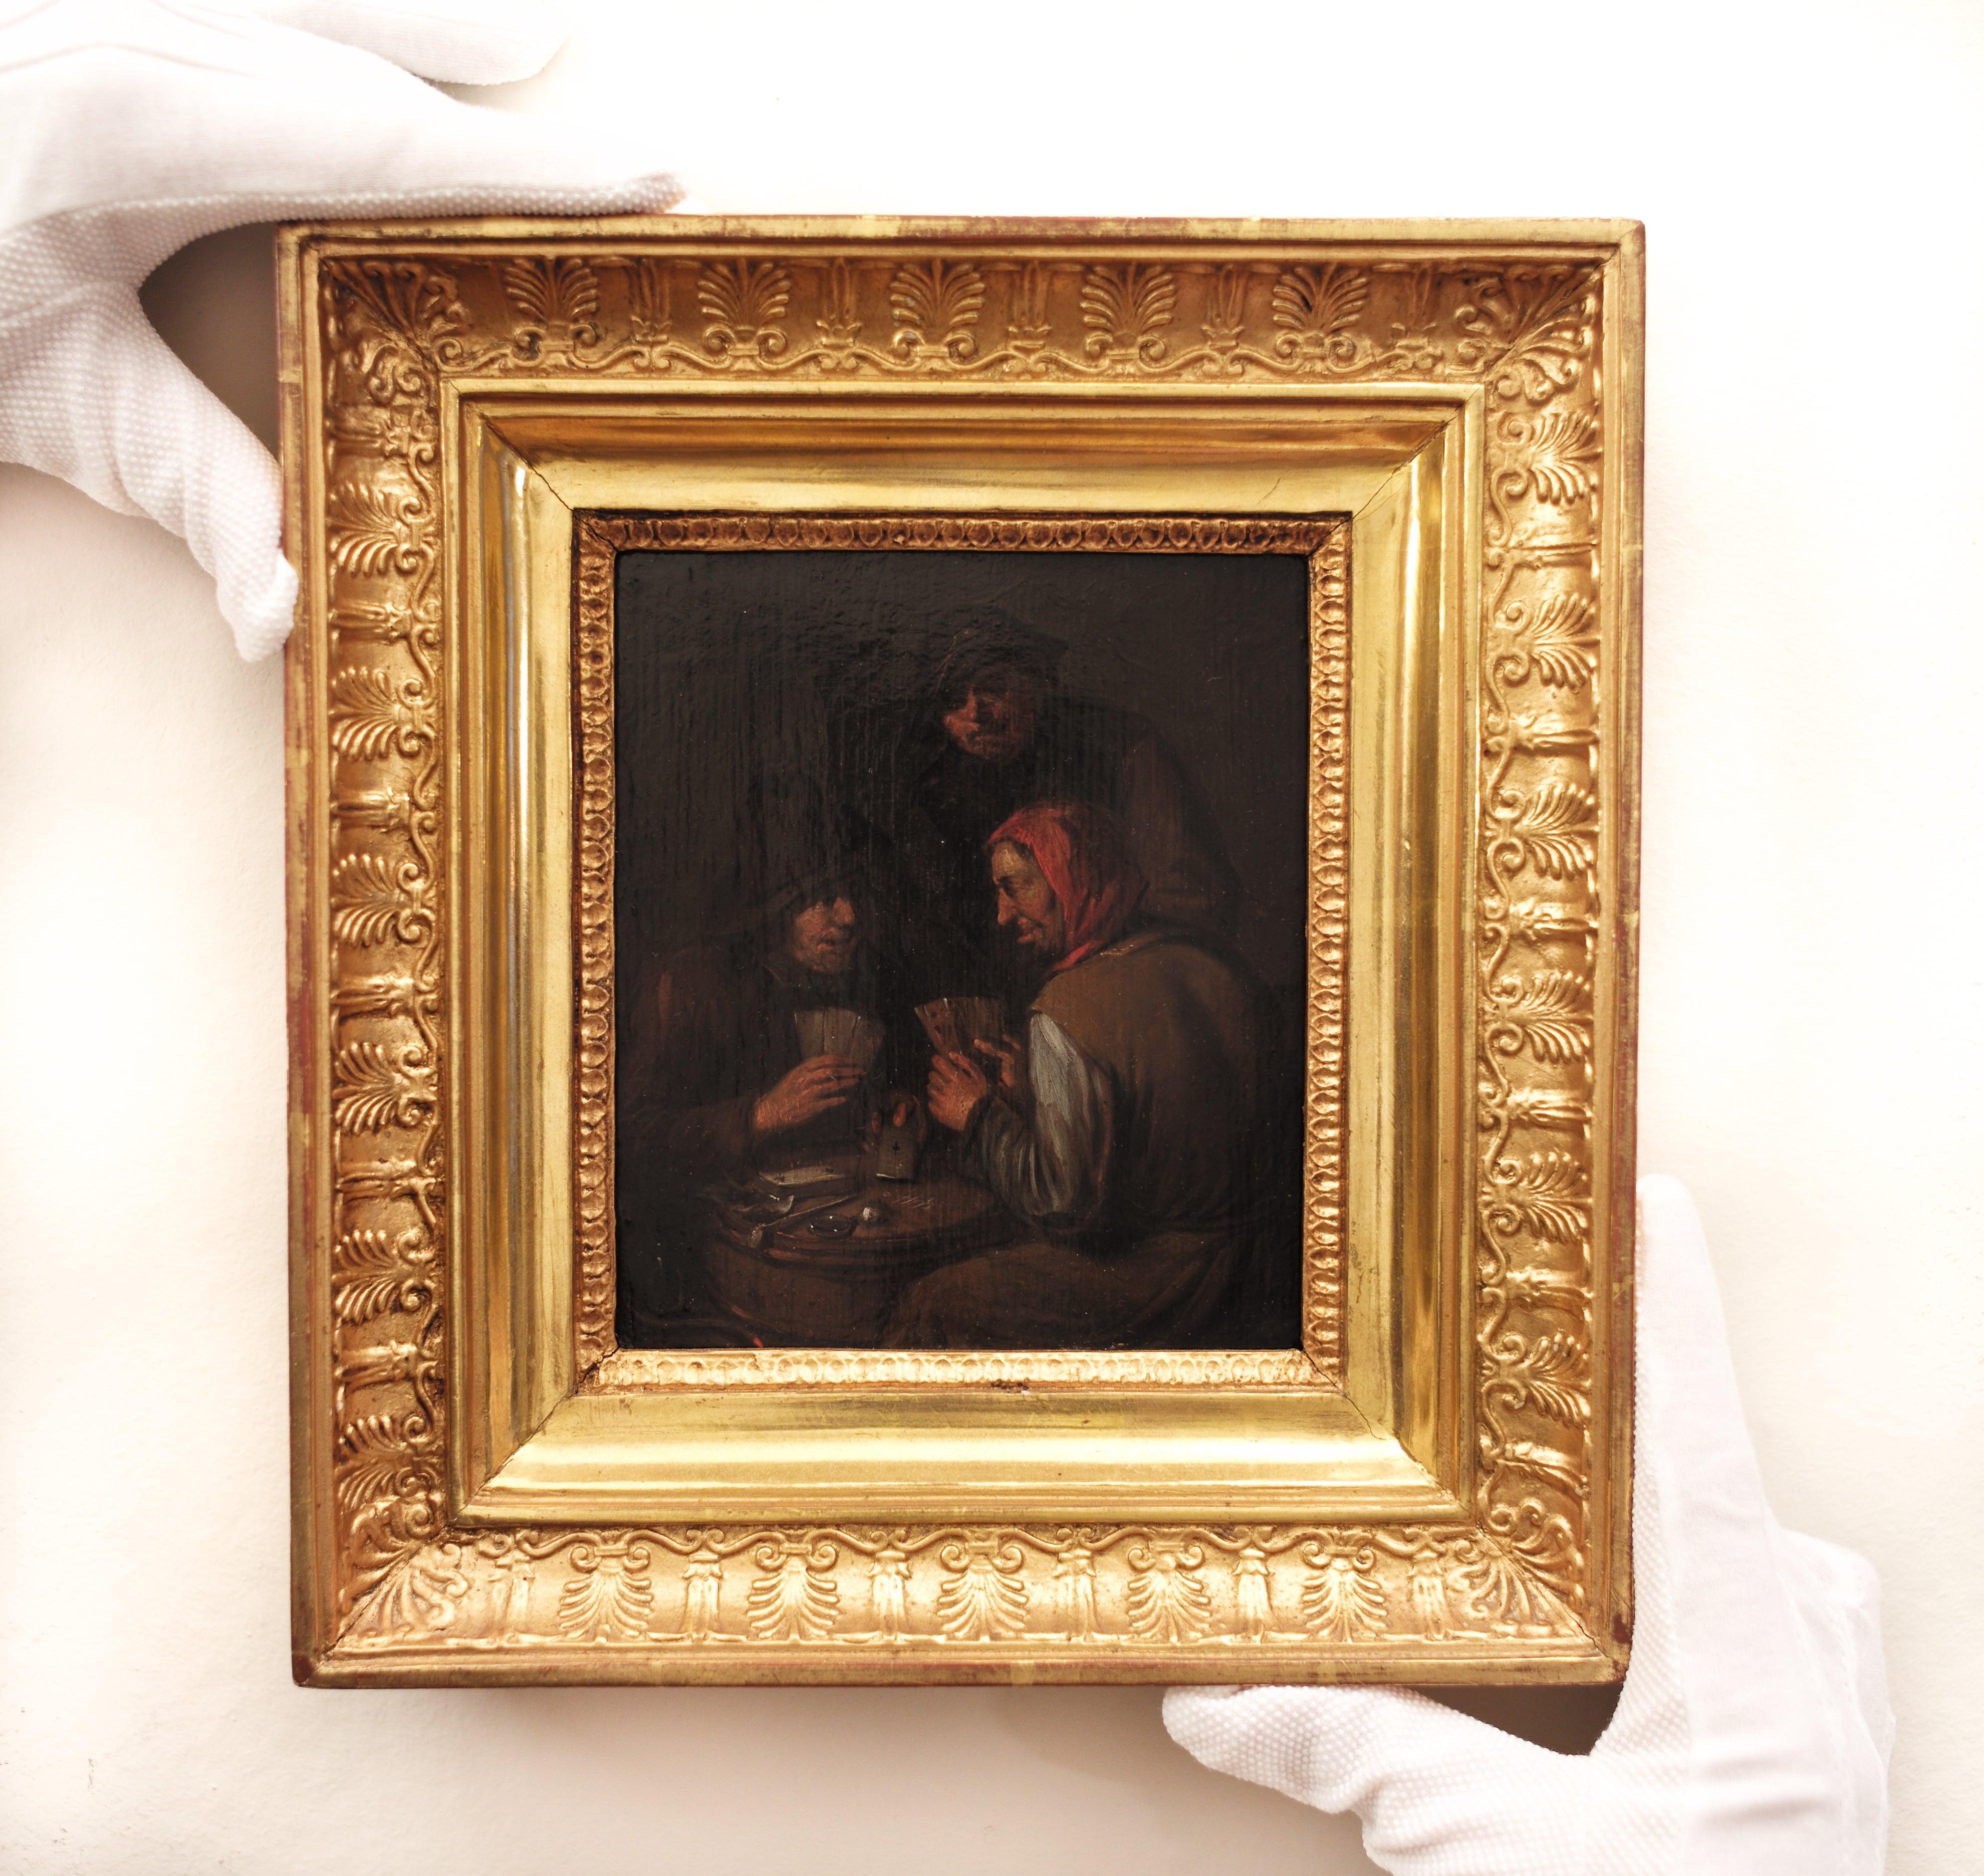 The Card Players by Egbert I Van Heemskerck, Old Master